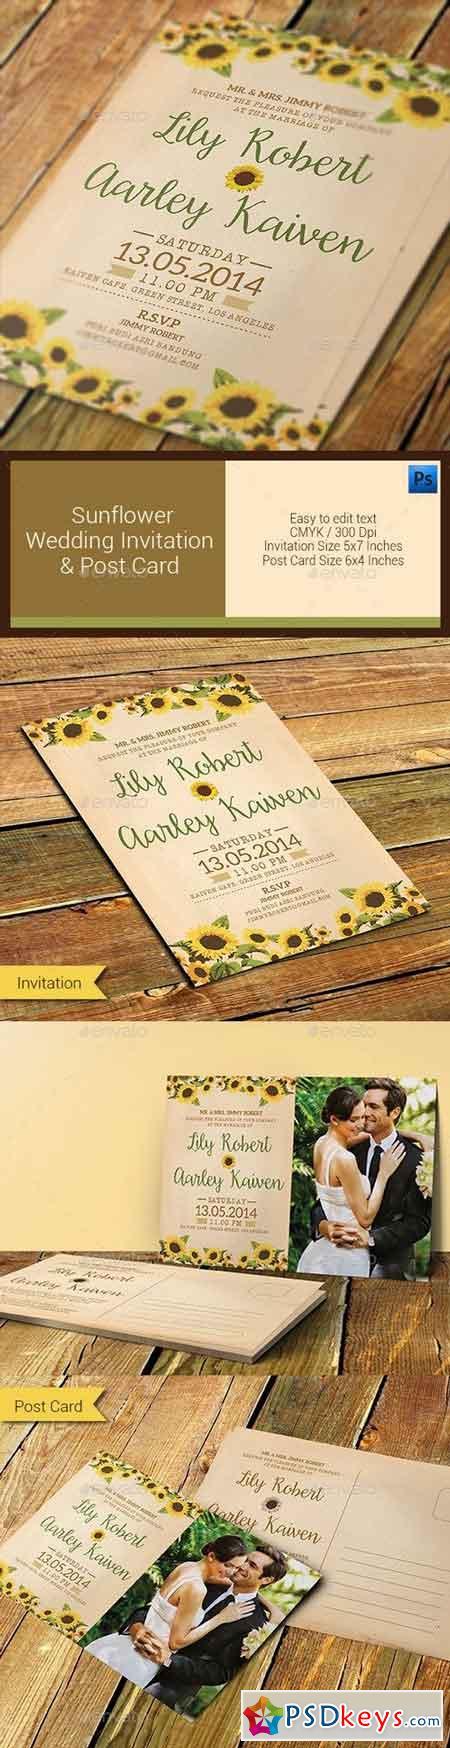 Sunflower Wedding Invitation & Post Card 11296659